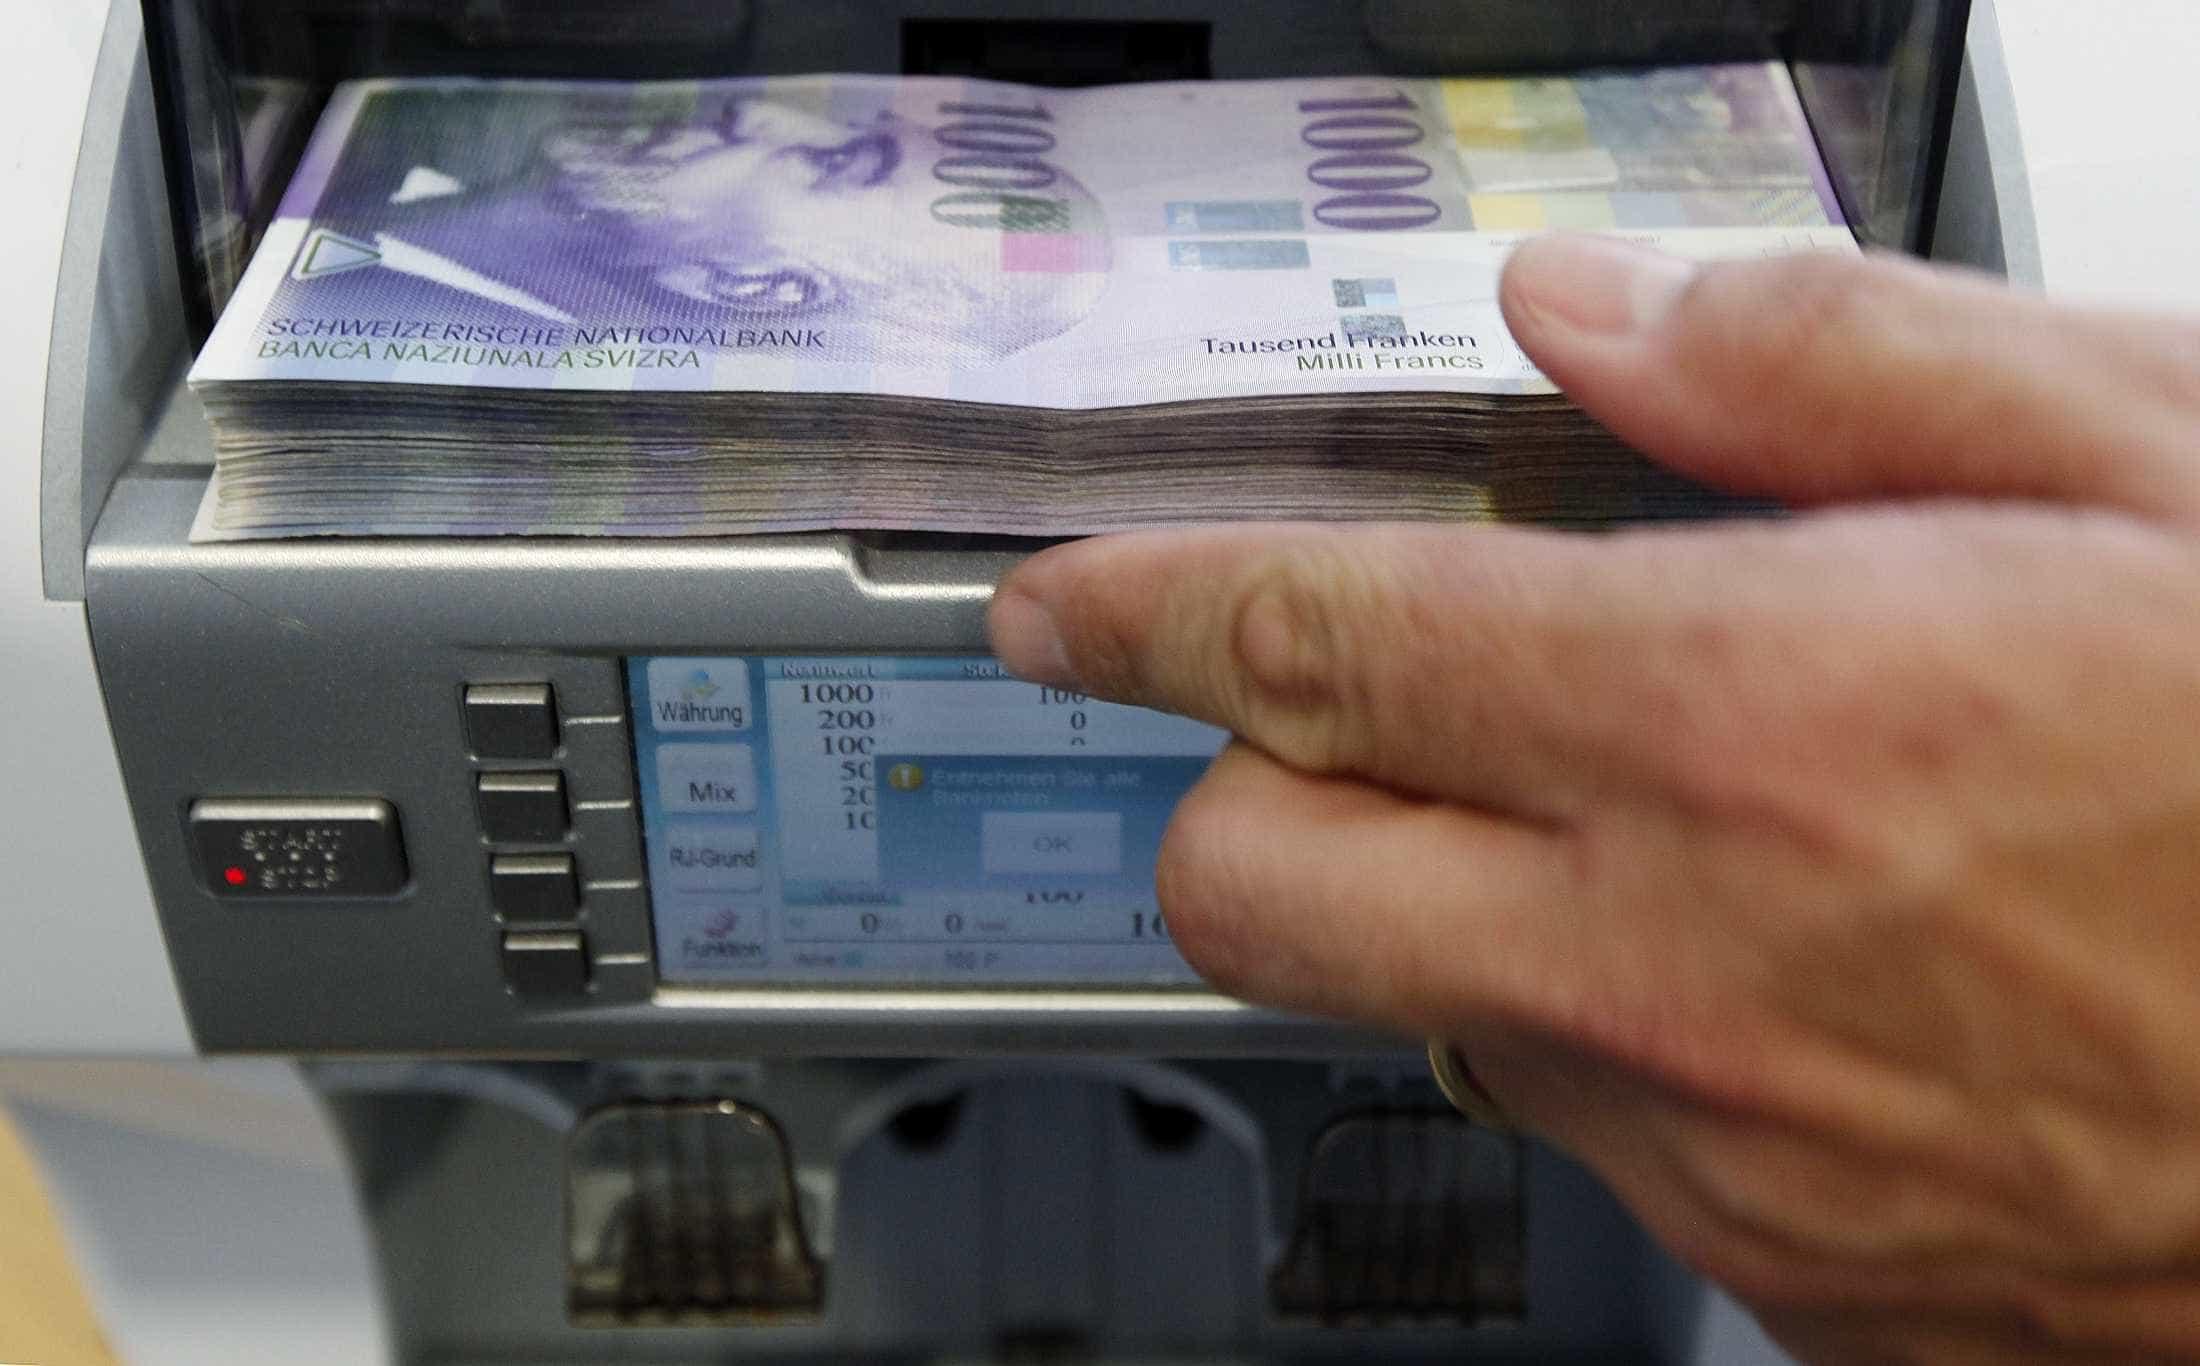 Brasileiros tiram R$ 9 bilhões da Suíça após Lava Jato